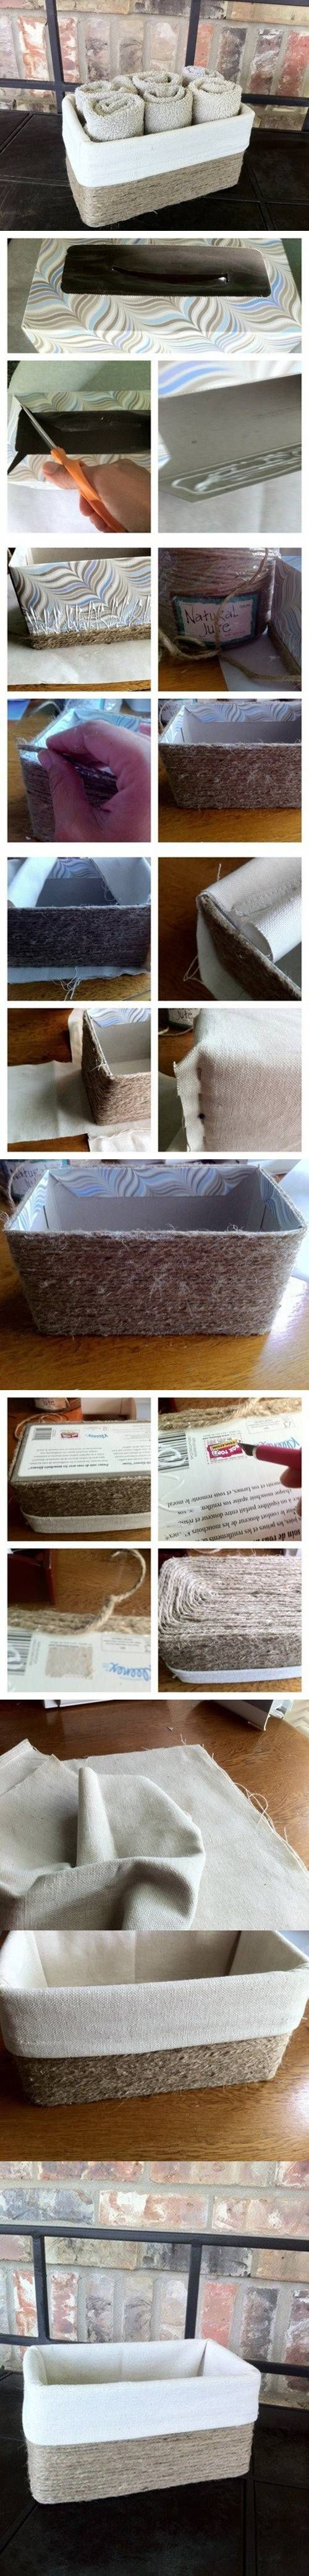 DIY Jute Basket from Cardboard Box DIY Projects /...